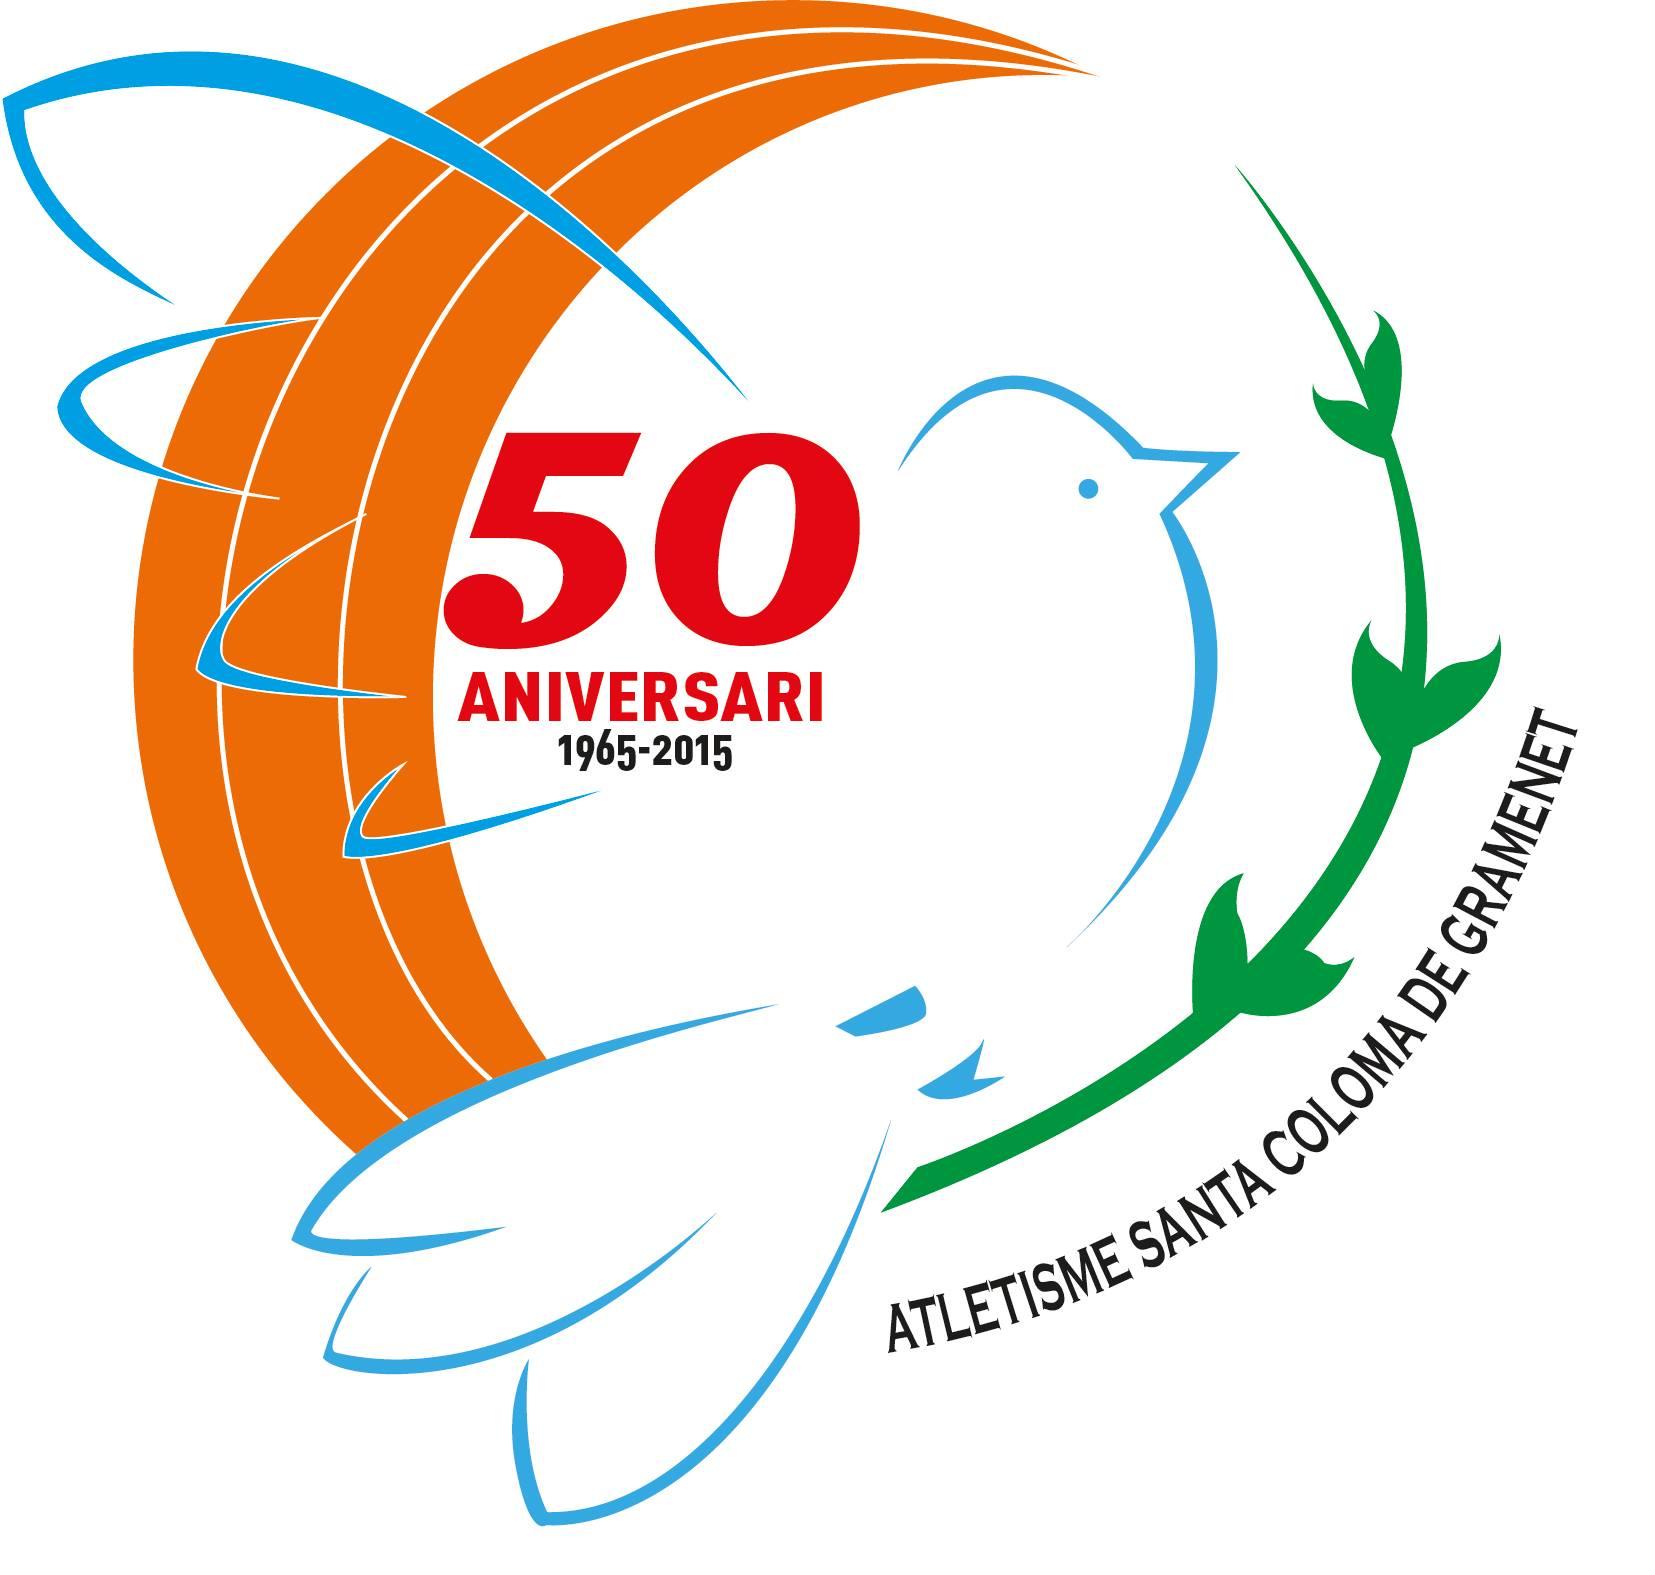 50 Aniversari Atletisme a Santa Coloma